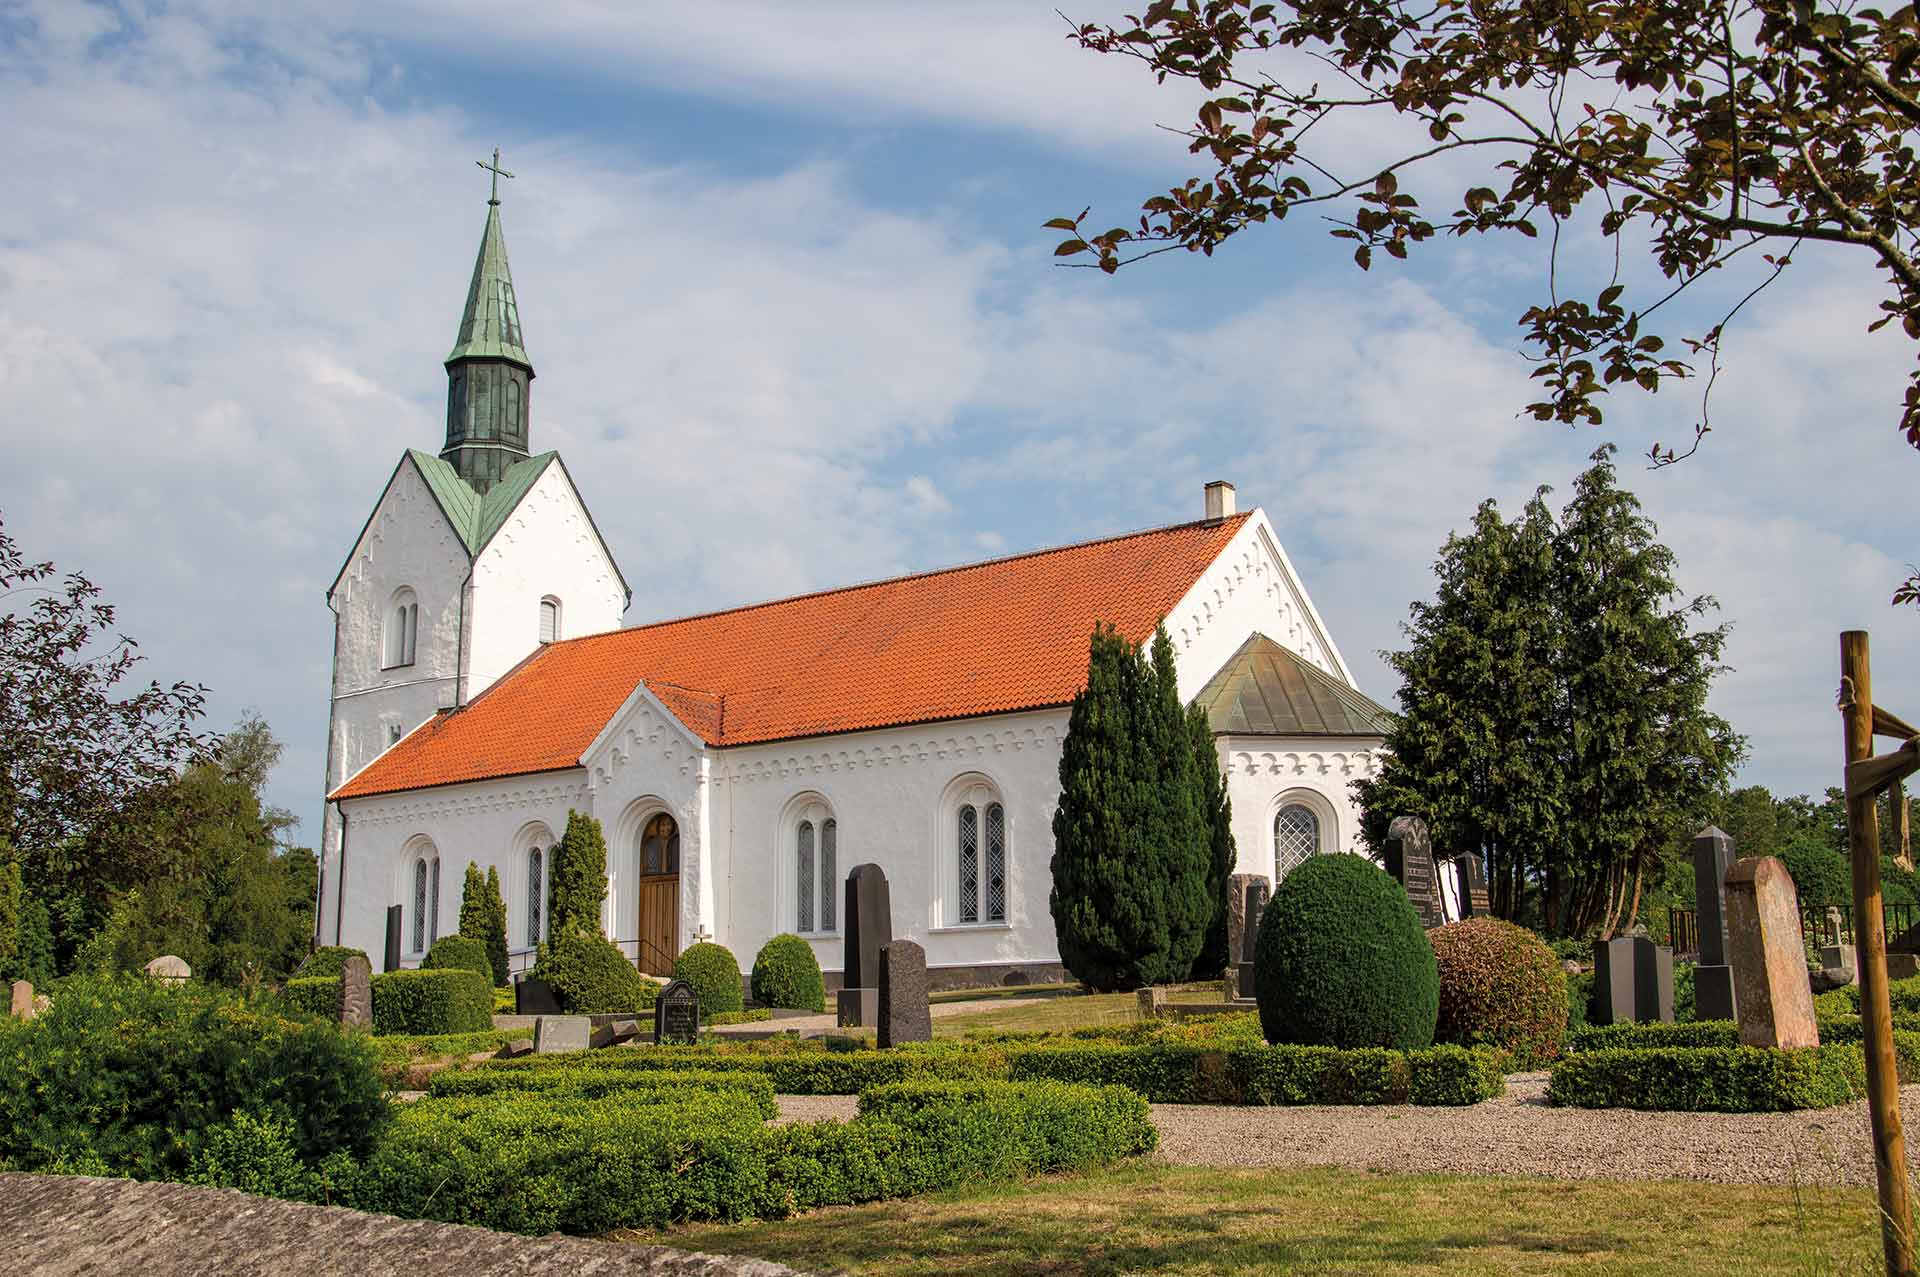 Holmby kyrka, foto Renée Backe